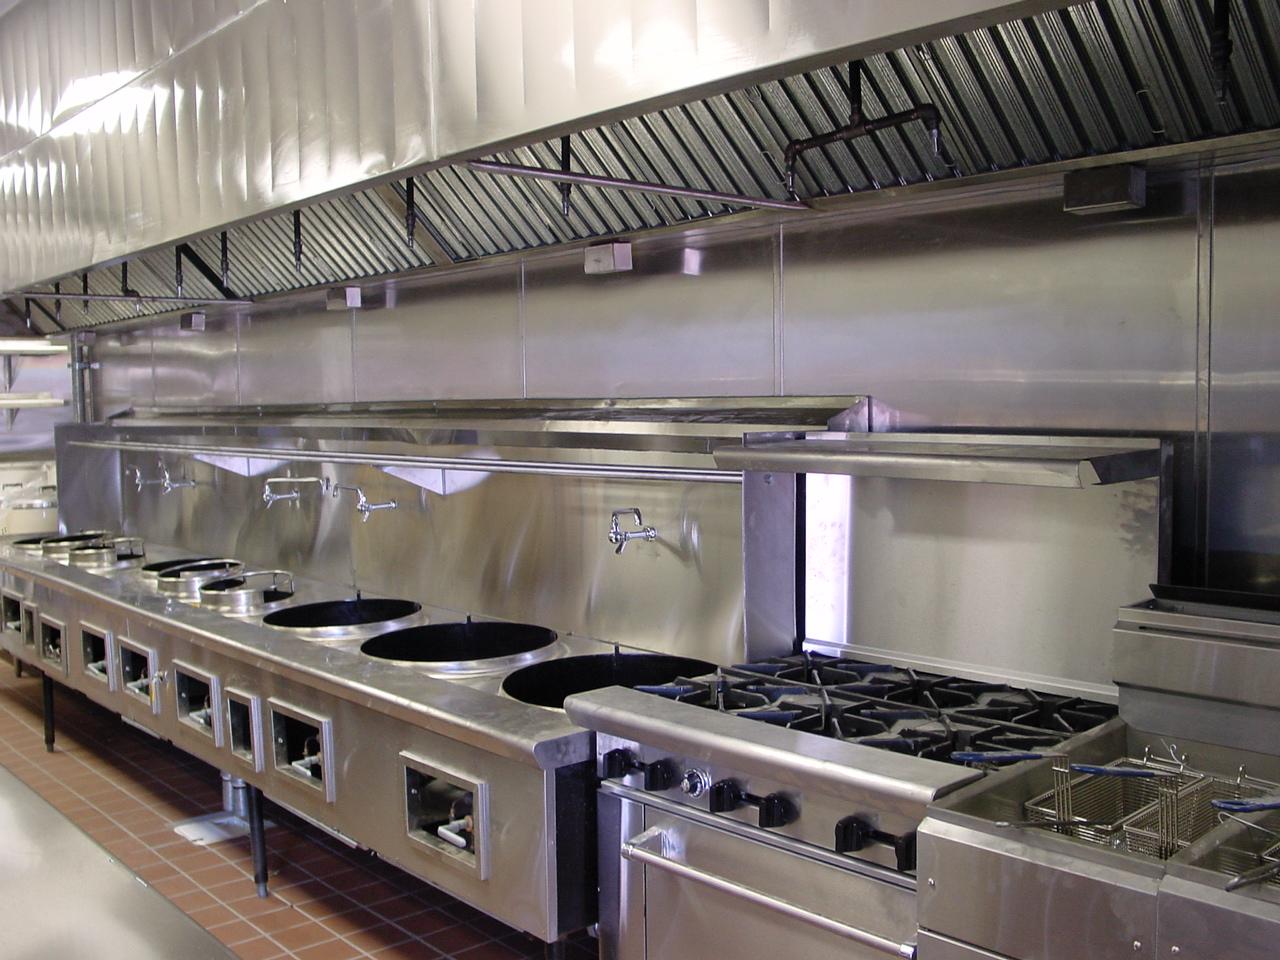 commercial kitchen hood installation undermount sink sizes wyoming